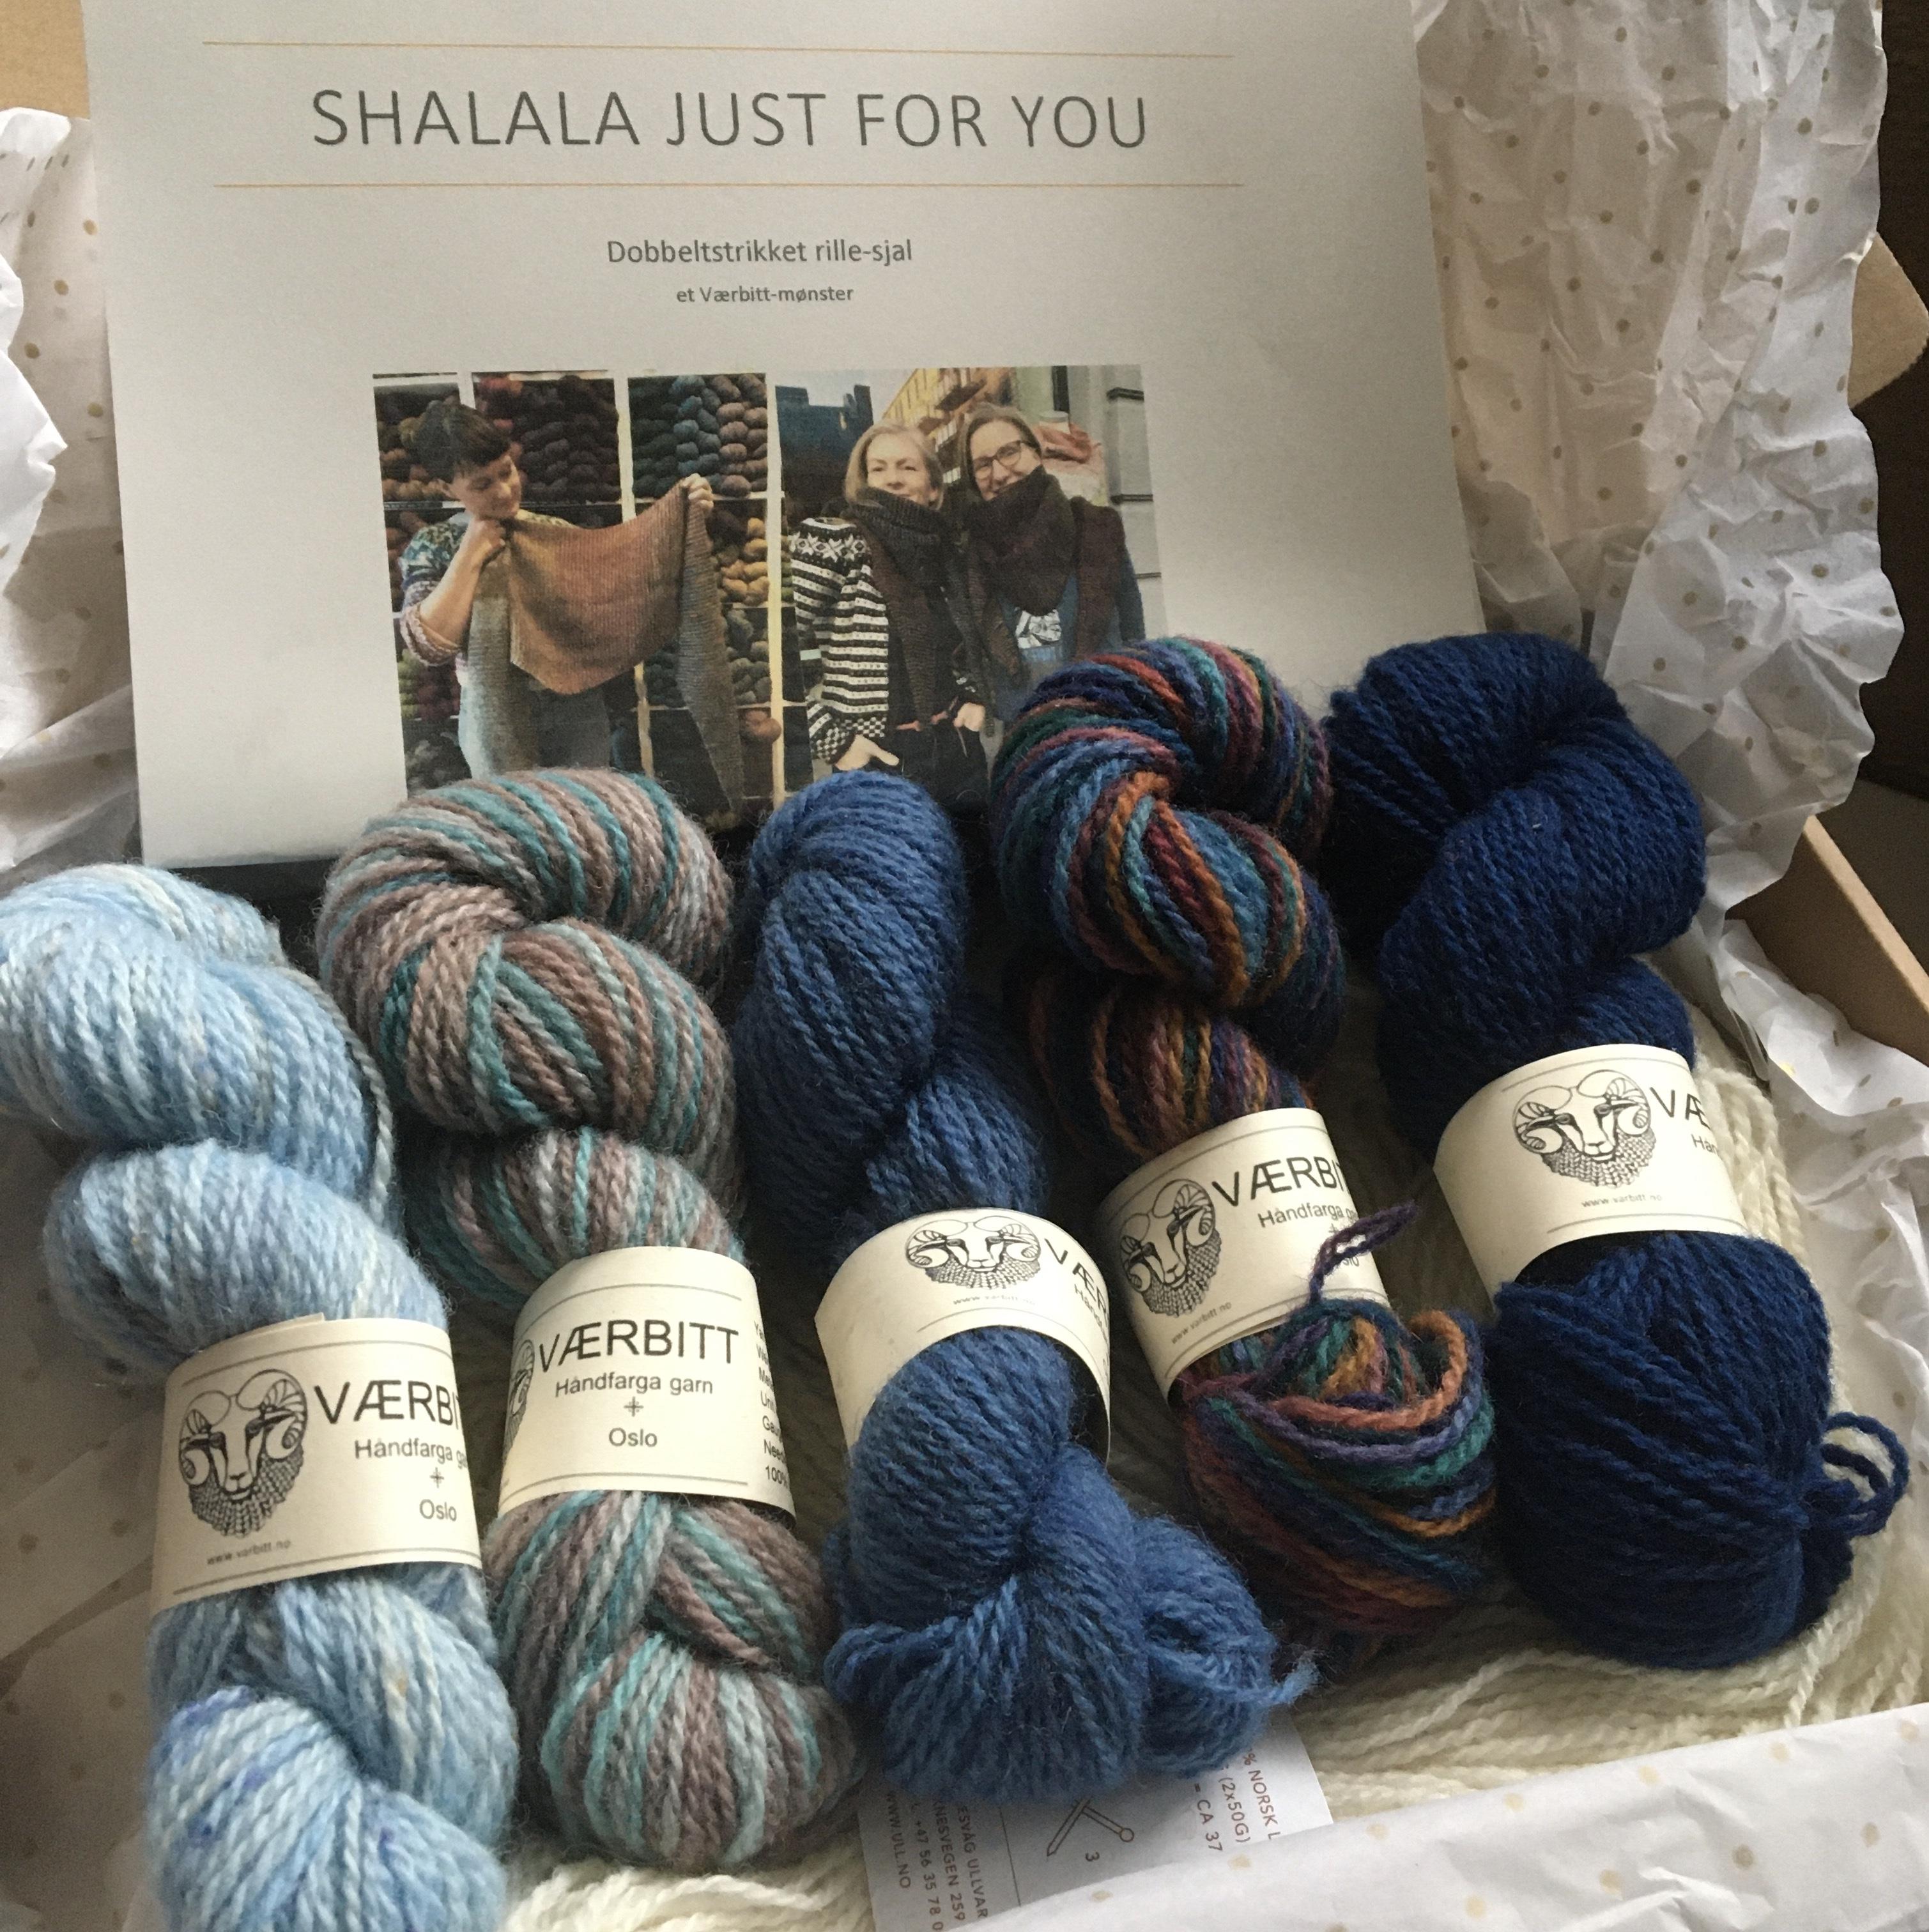 Værbitt, Shalala just for you